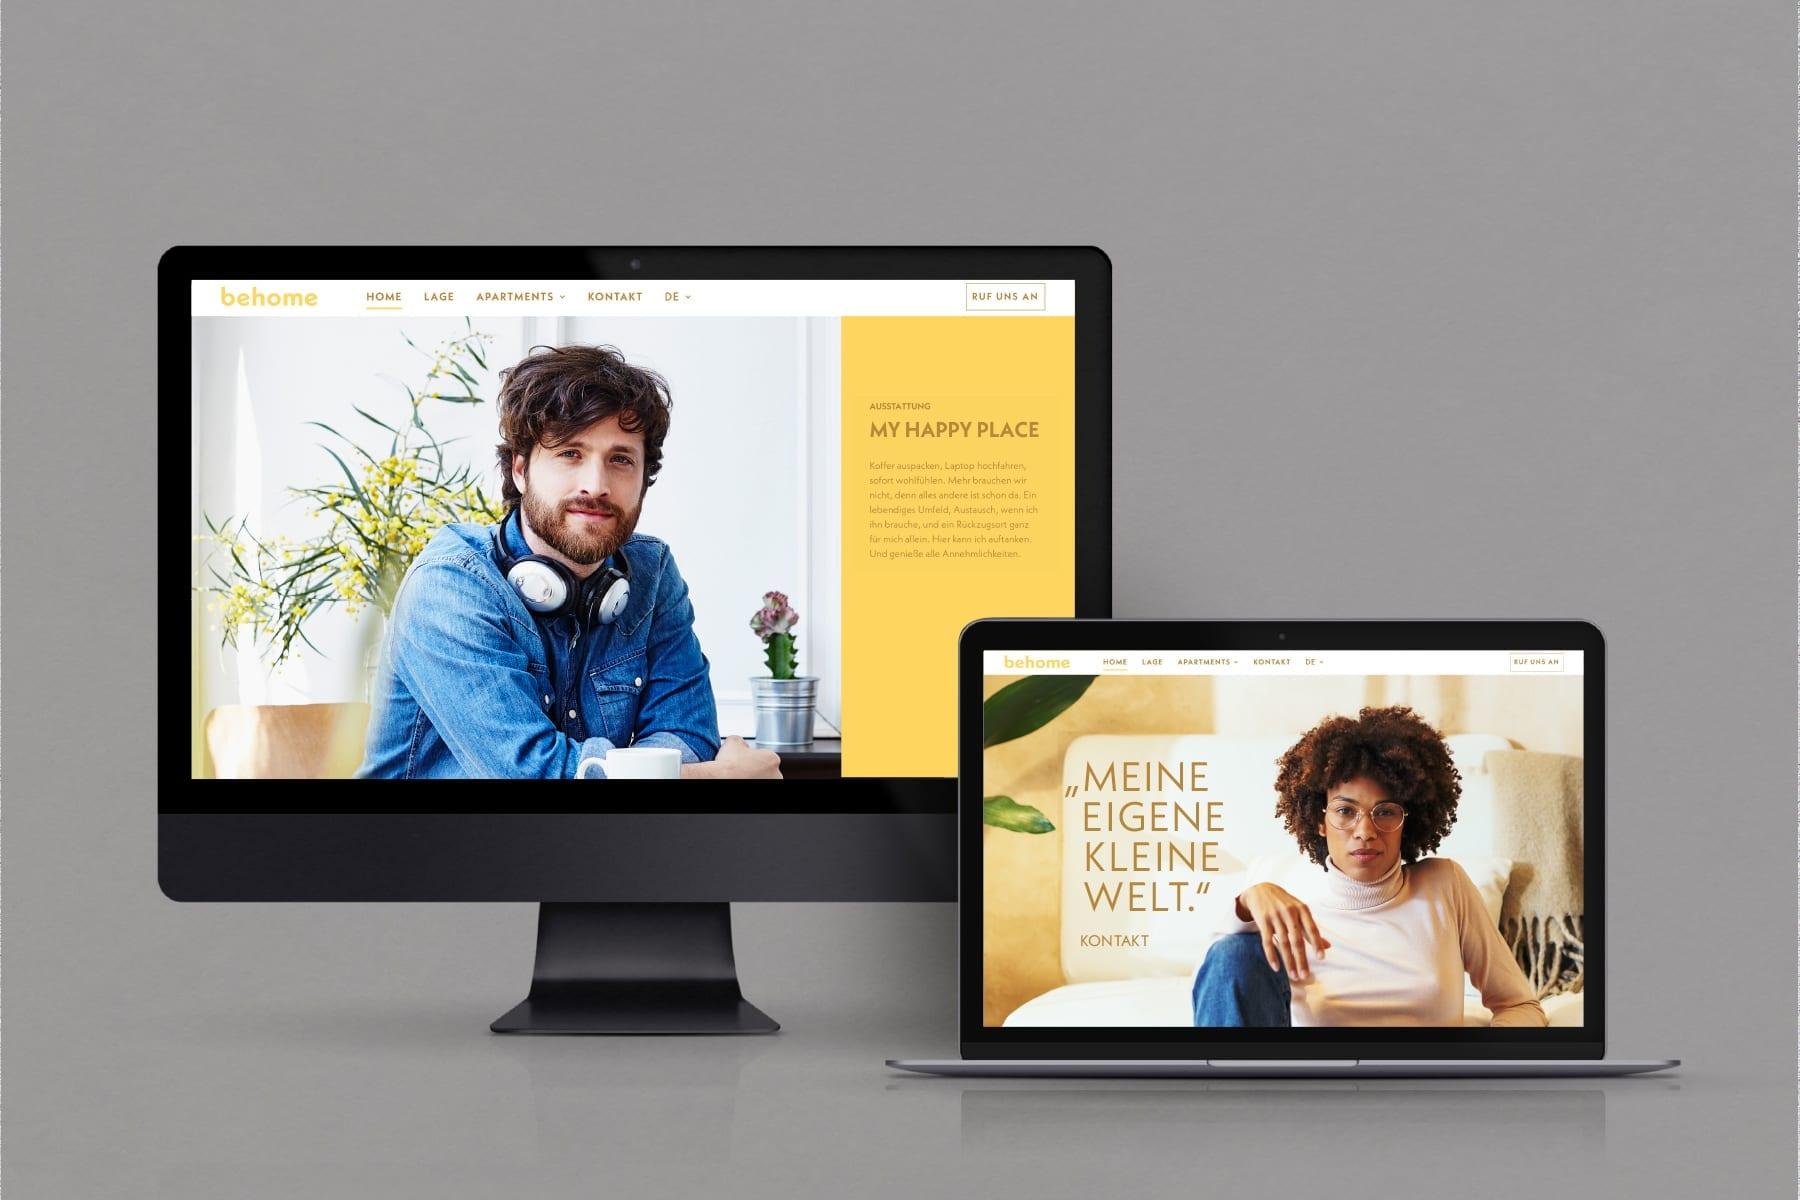 behome - Markenentwicklung responsive Website